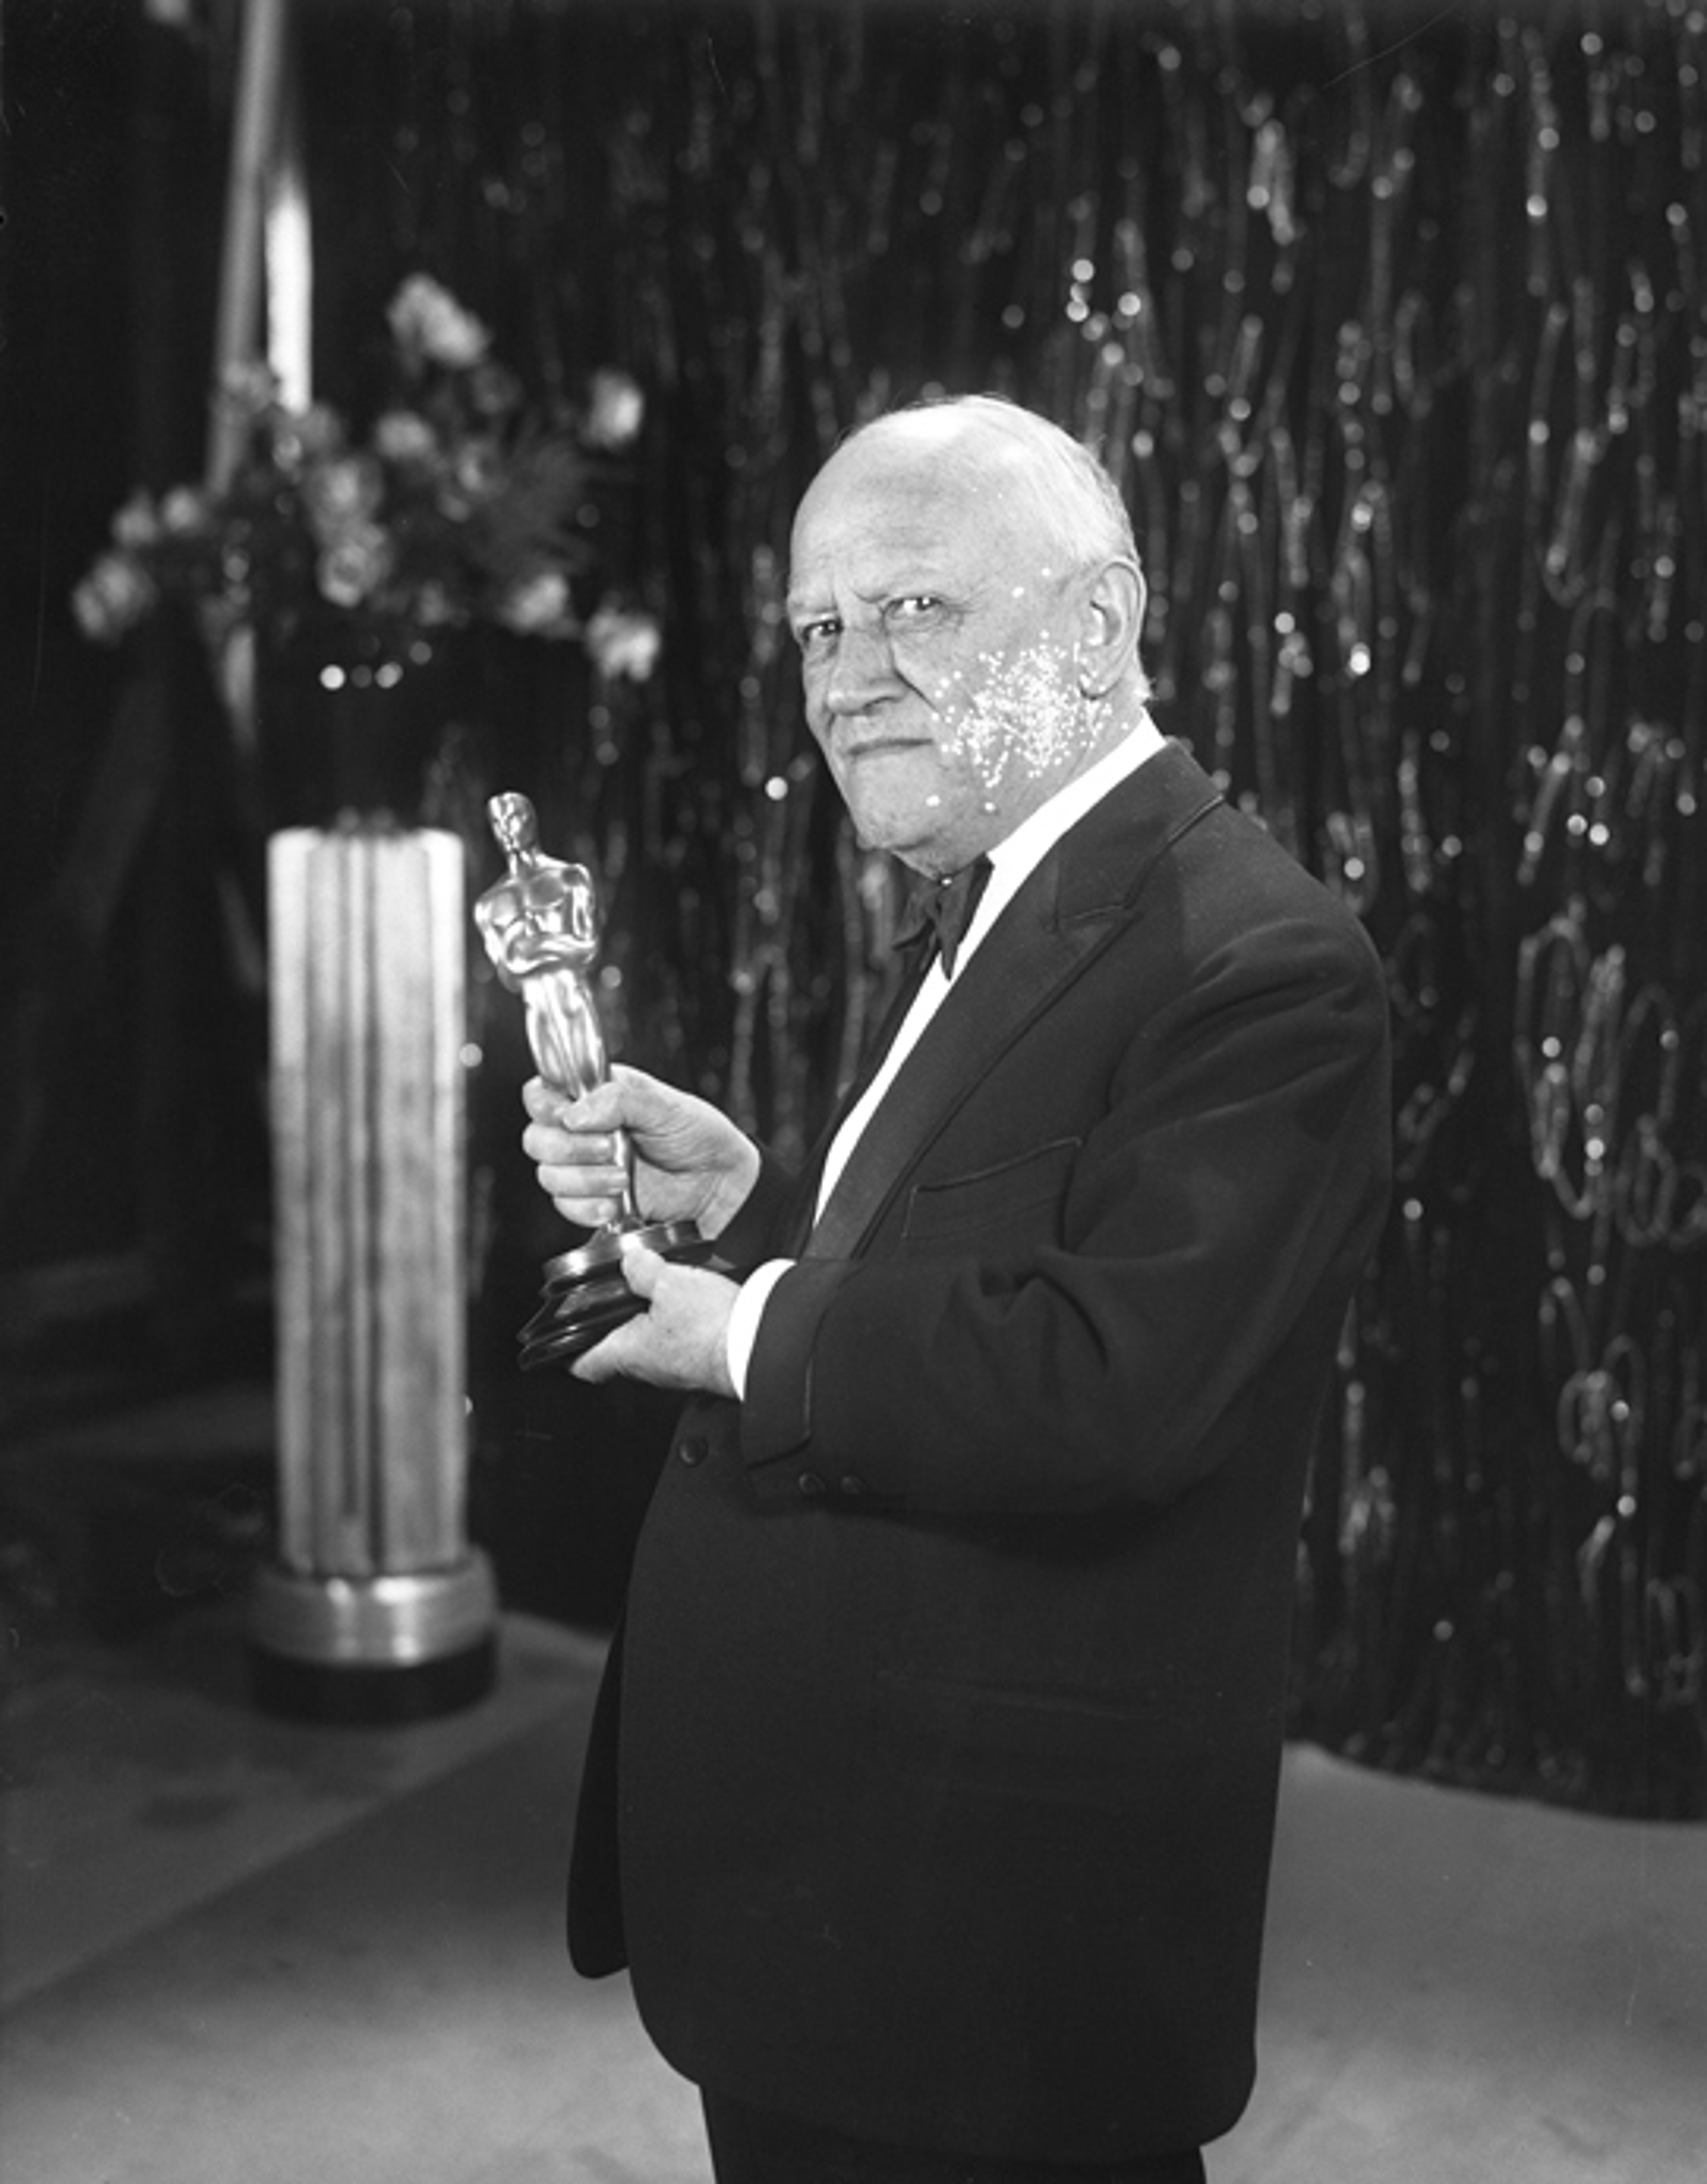 Carl Laemmle holding an Oscar trophy, 1930.jpg